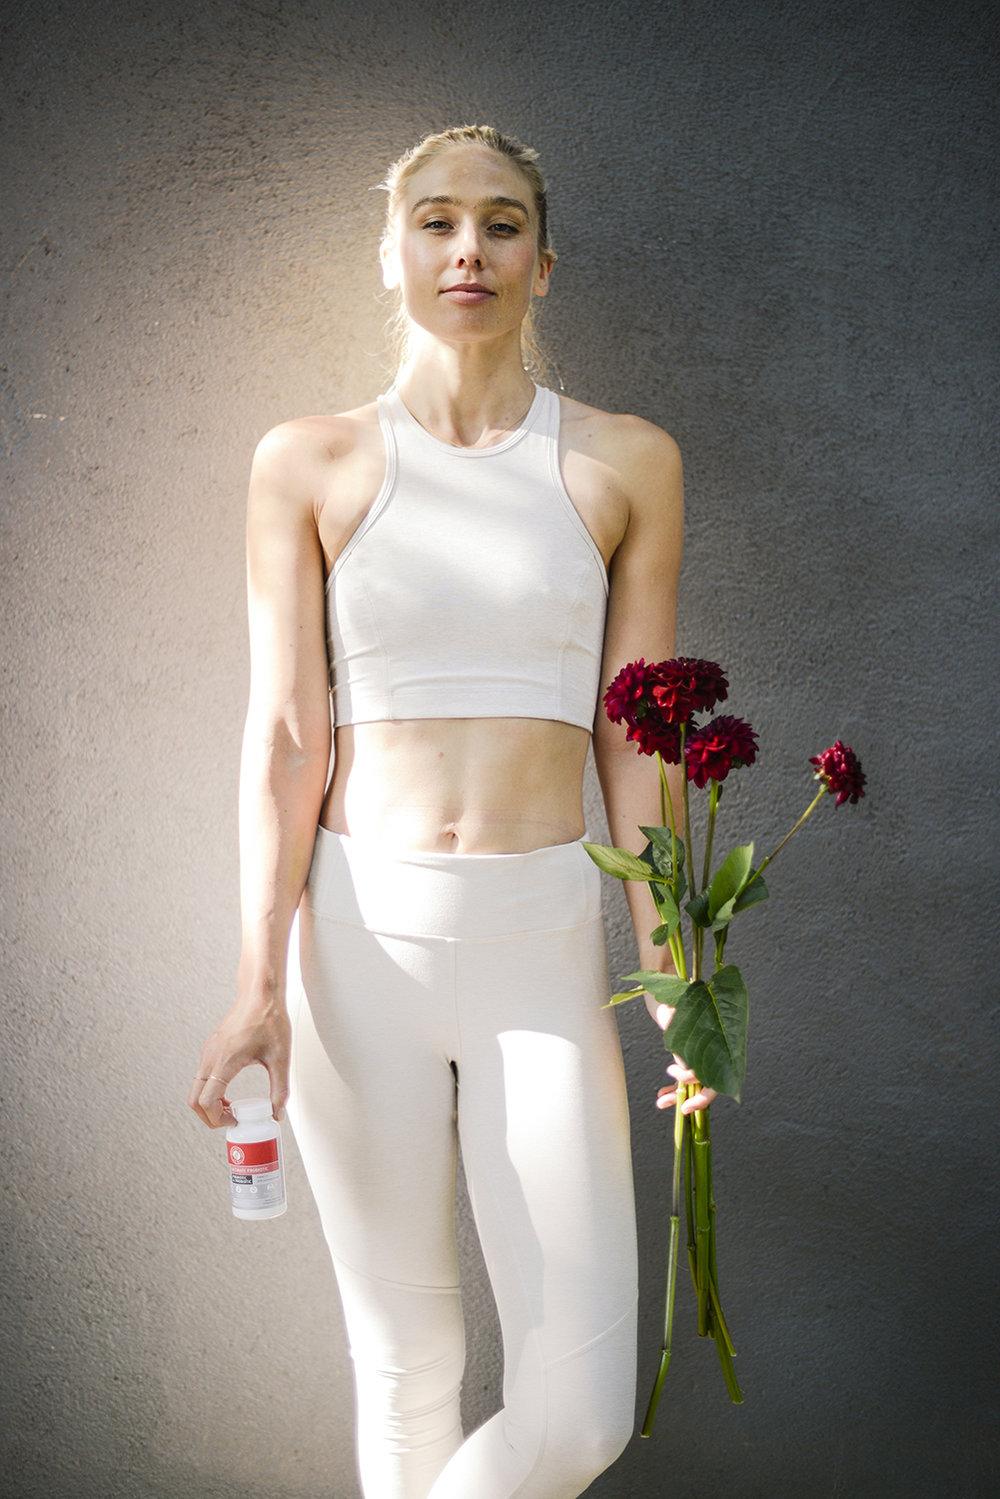 Natalie Uhling: Listen to Your Body